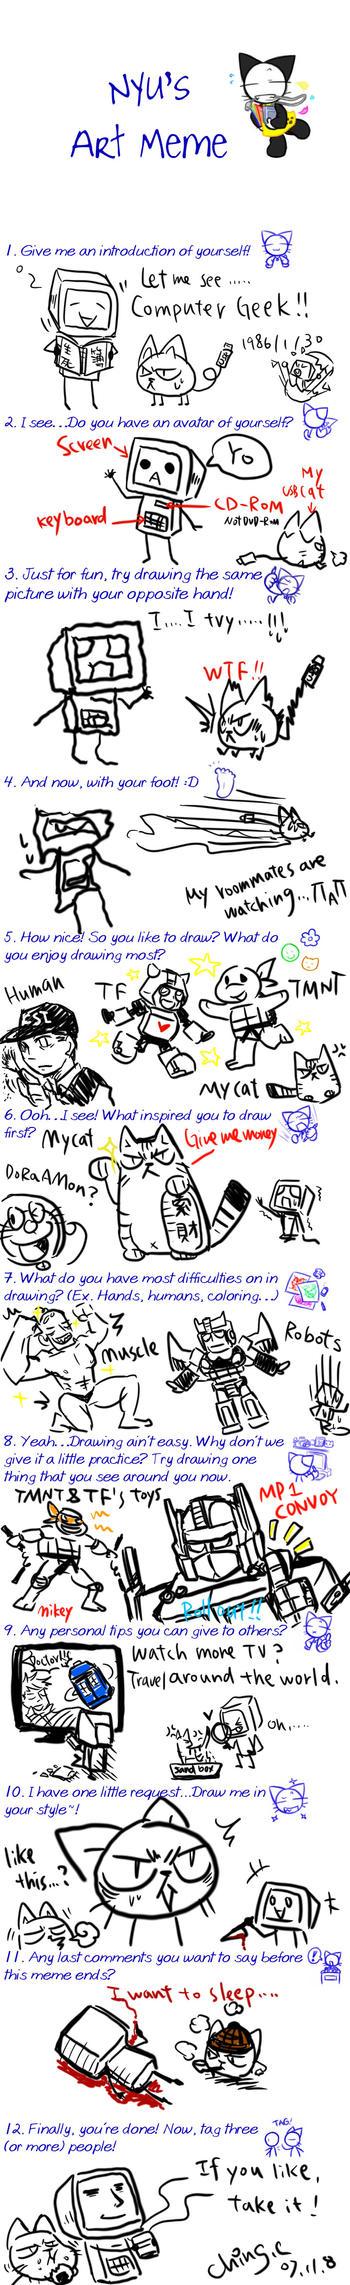 nyu's art meme by chingc